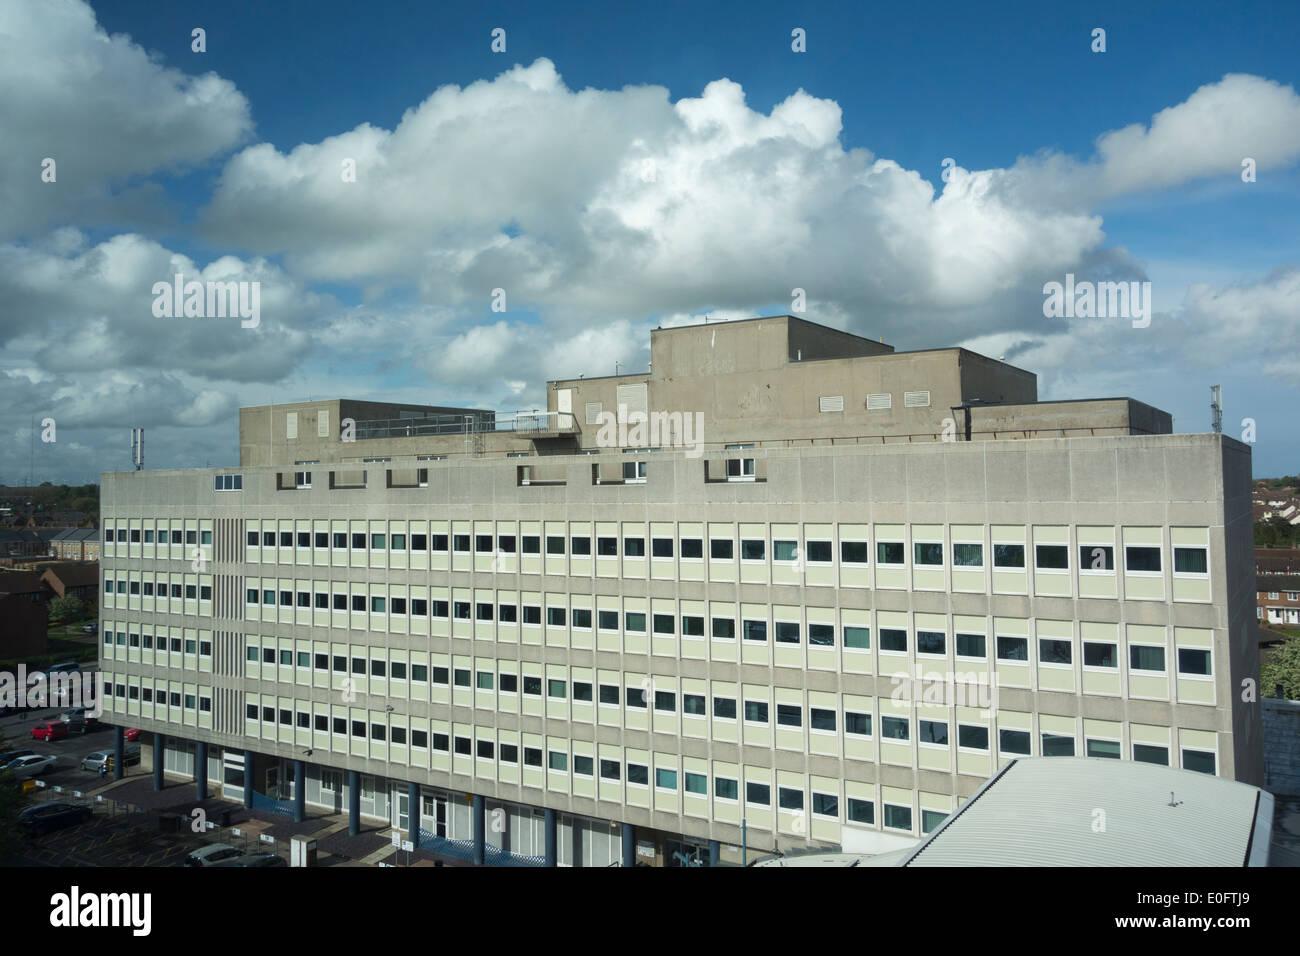 University Hospital Of North Tees Hardwick Stockton On Tees North Stock Photo Royalty Free ...